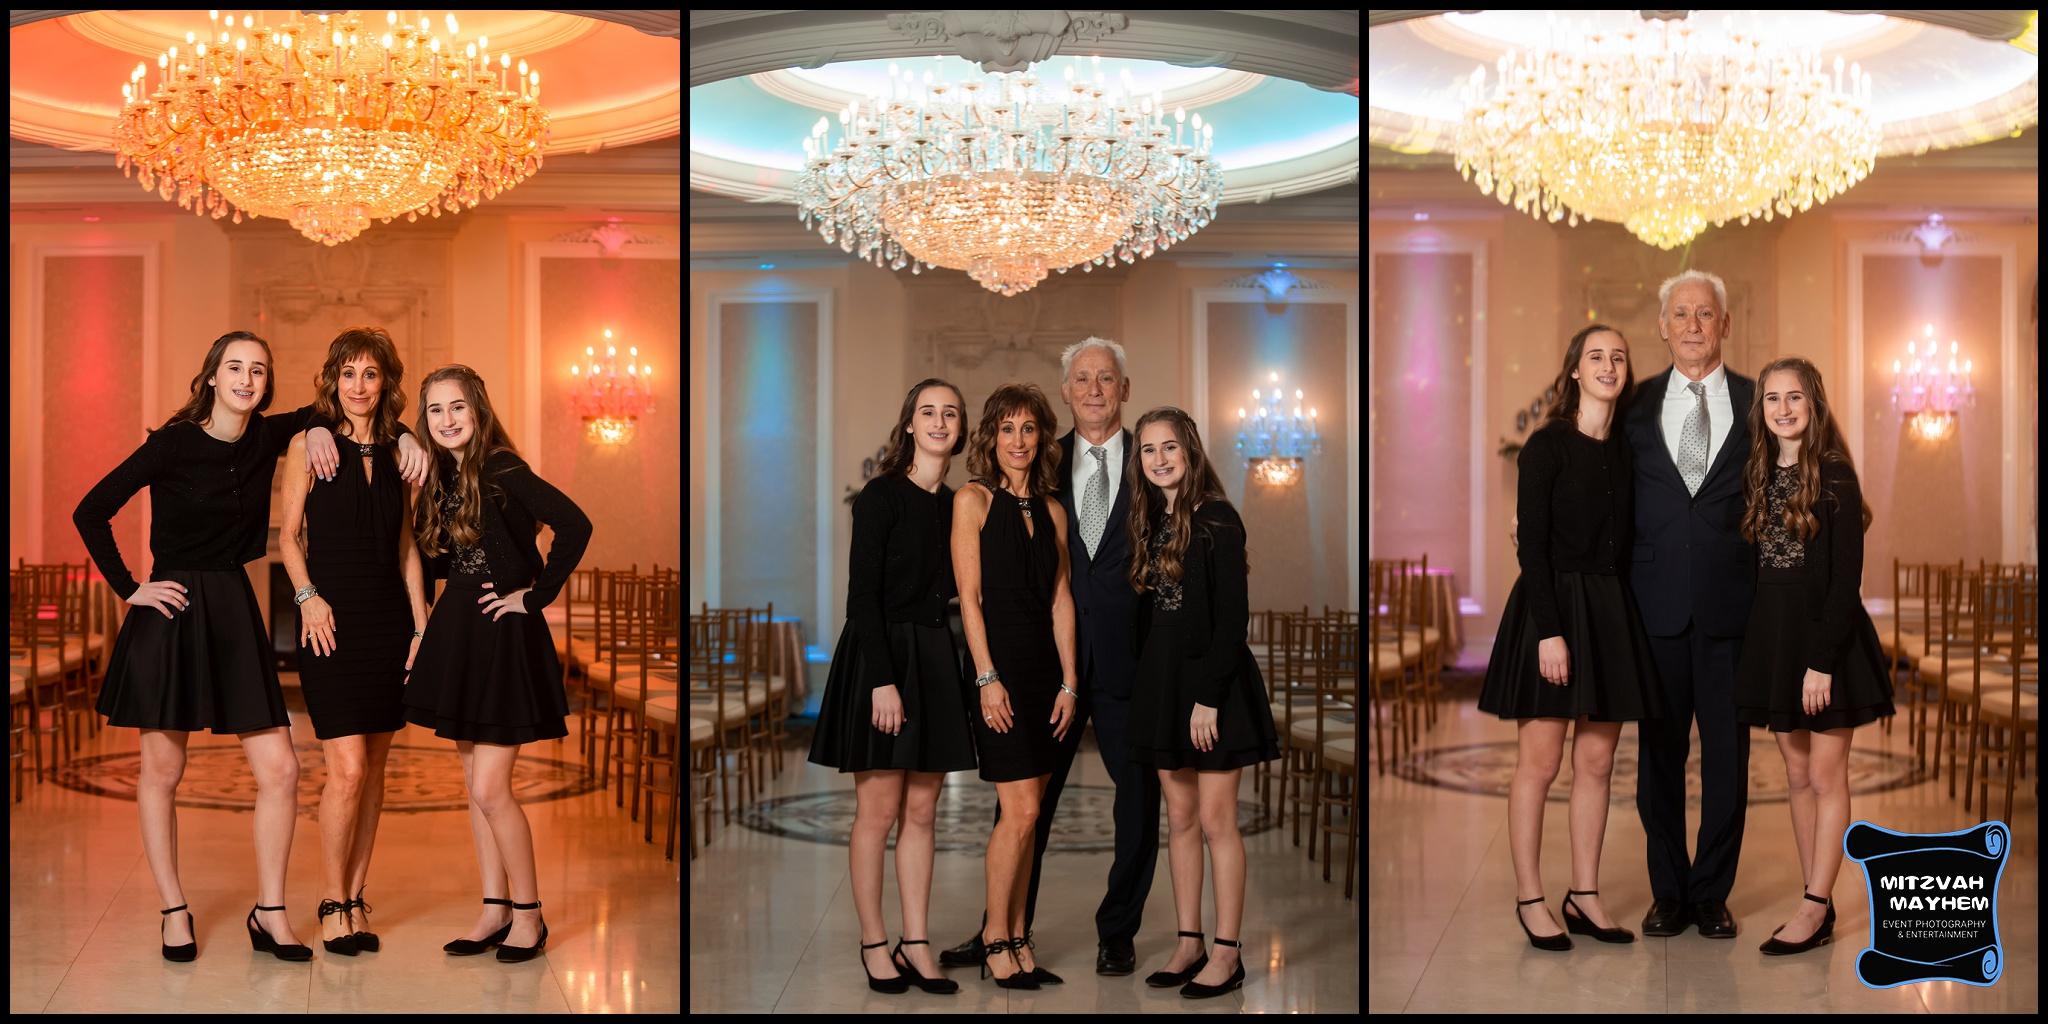 new-jersey-mitzvah-photographer-primavera-regency-ava-sophia-3.JPG